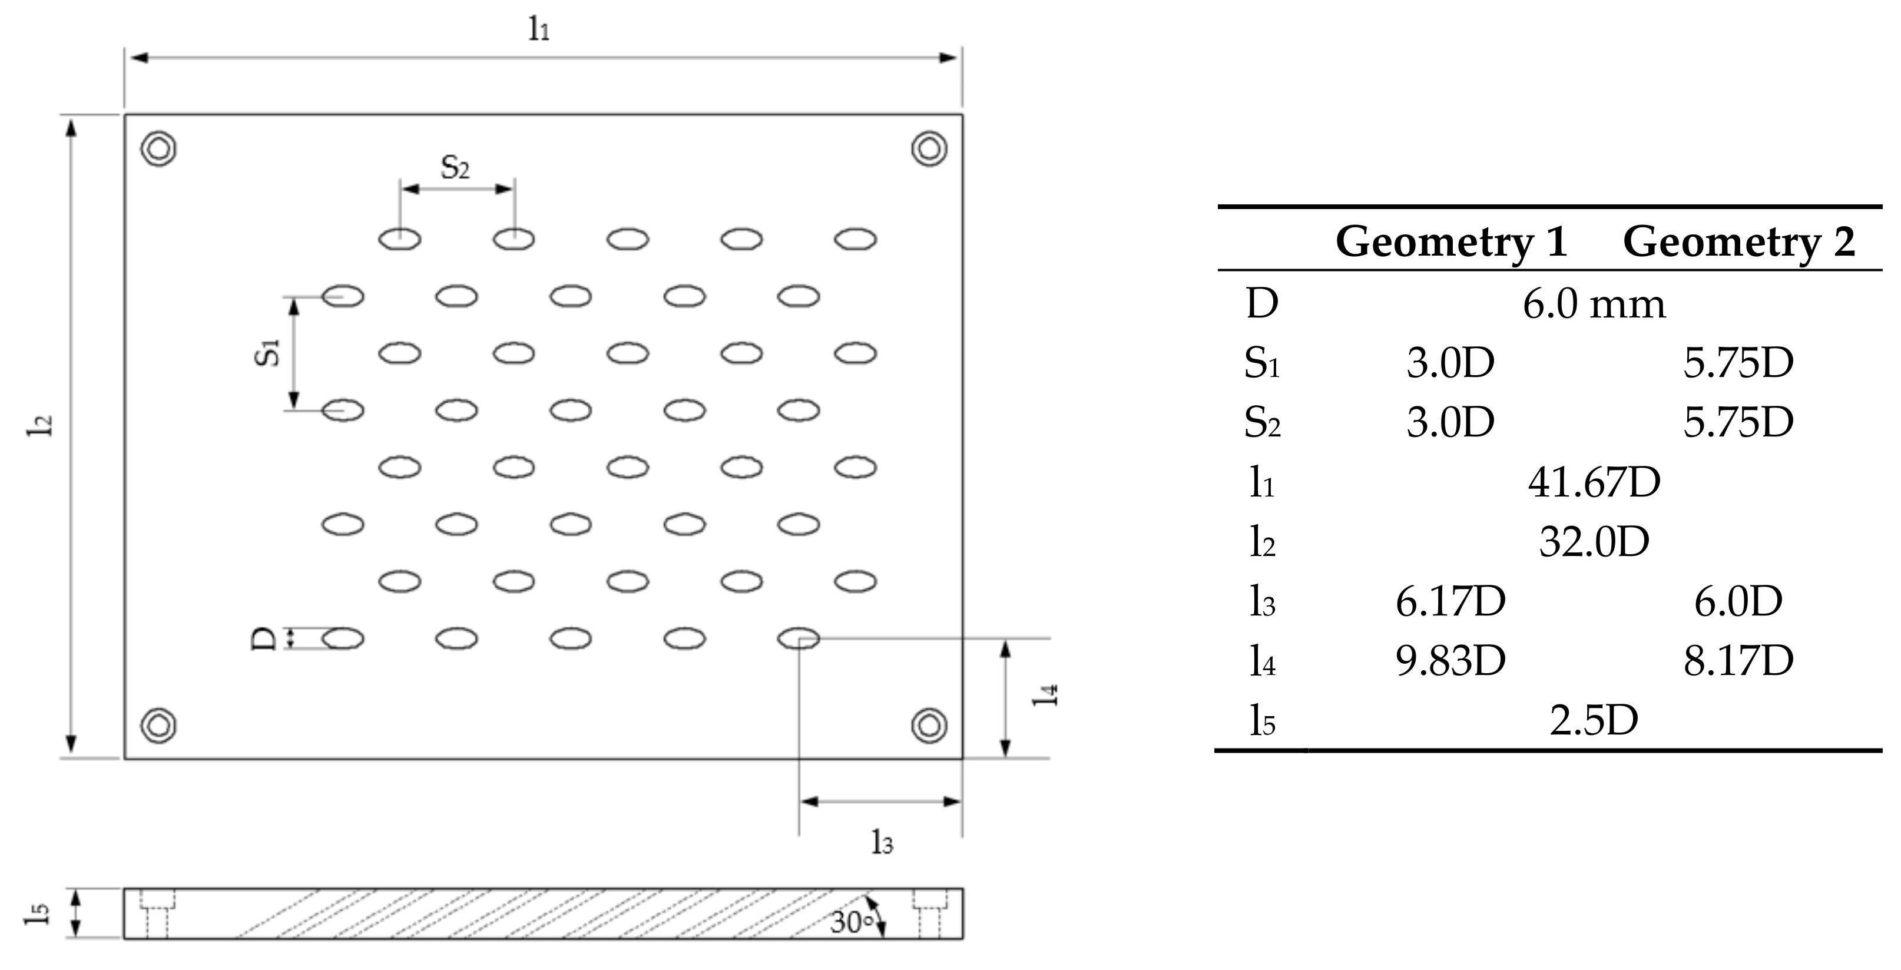 Statistics Excel Spreadsheet For Excel Timeline Template And Excel For Dummies Oder Statistics Excel